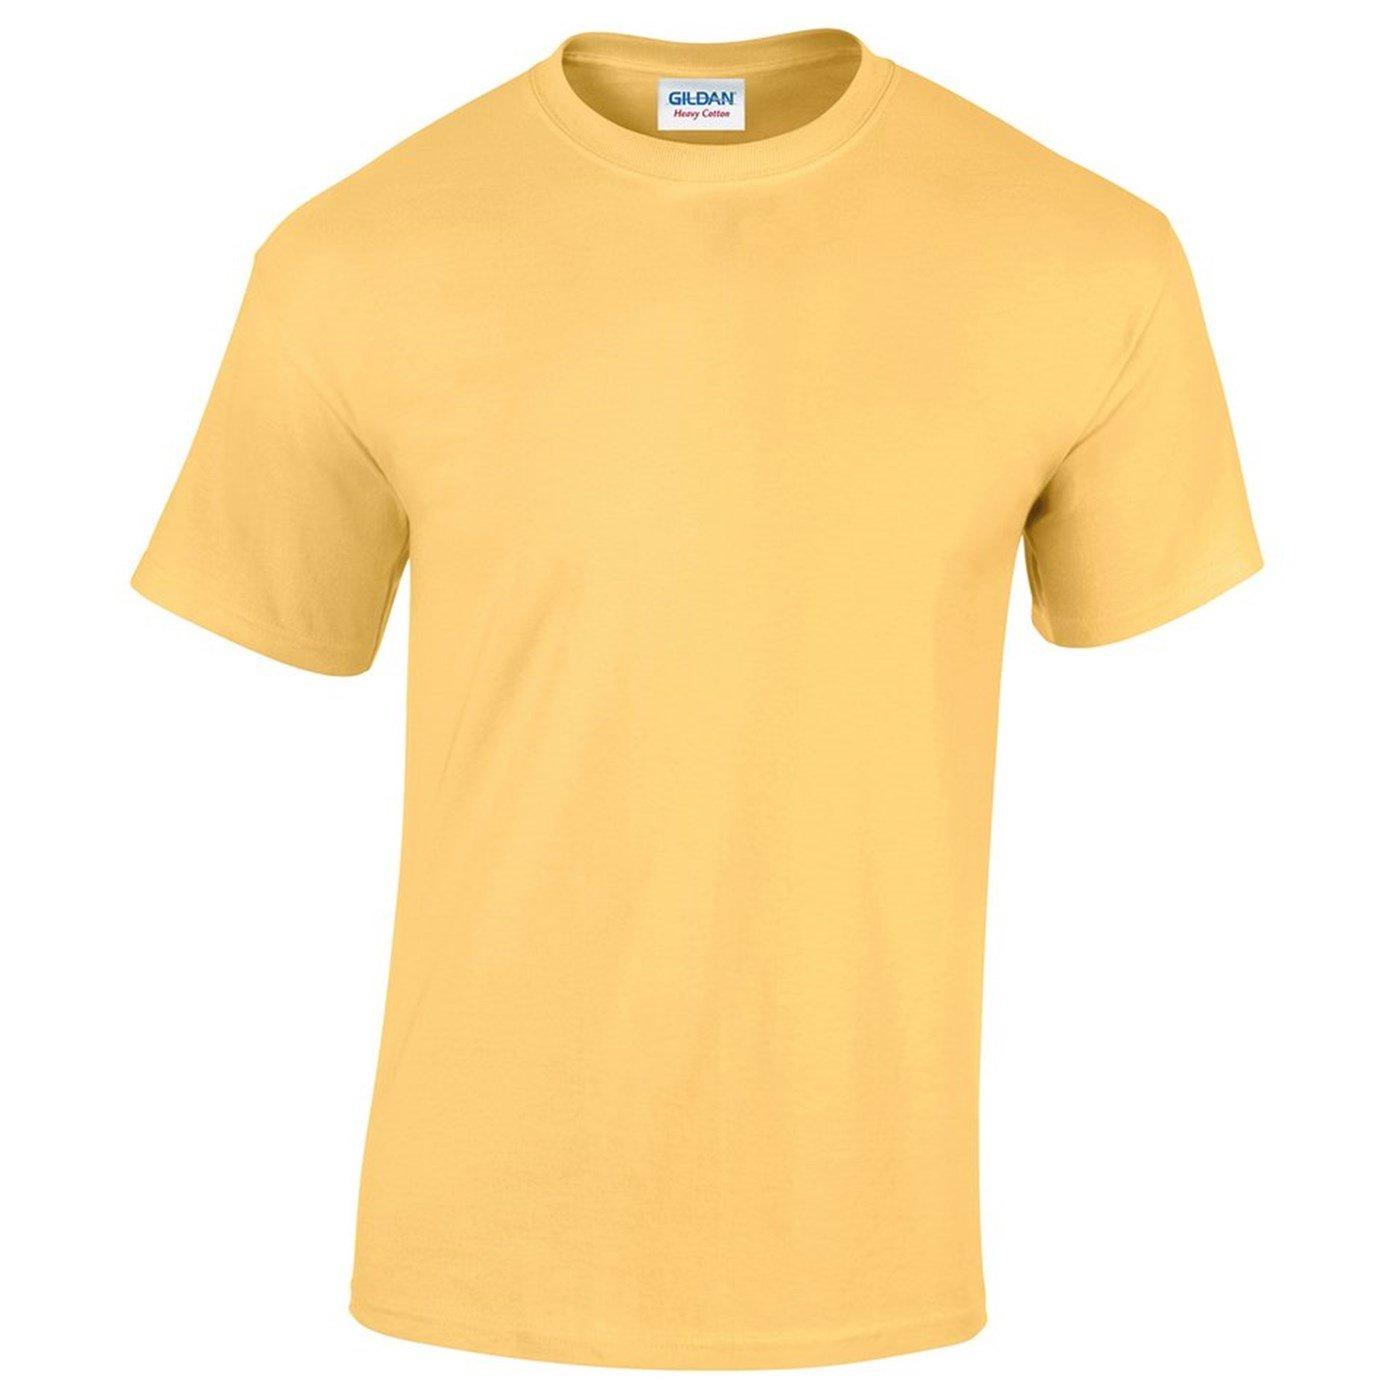 3f2a725c02bbe7 Gildan Adult's Heavy Cotton T-shirt GD005